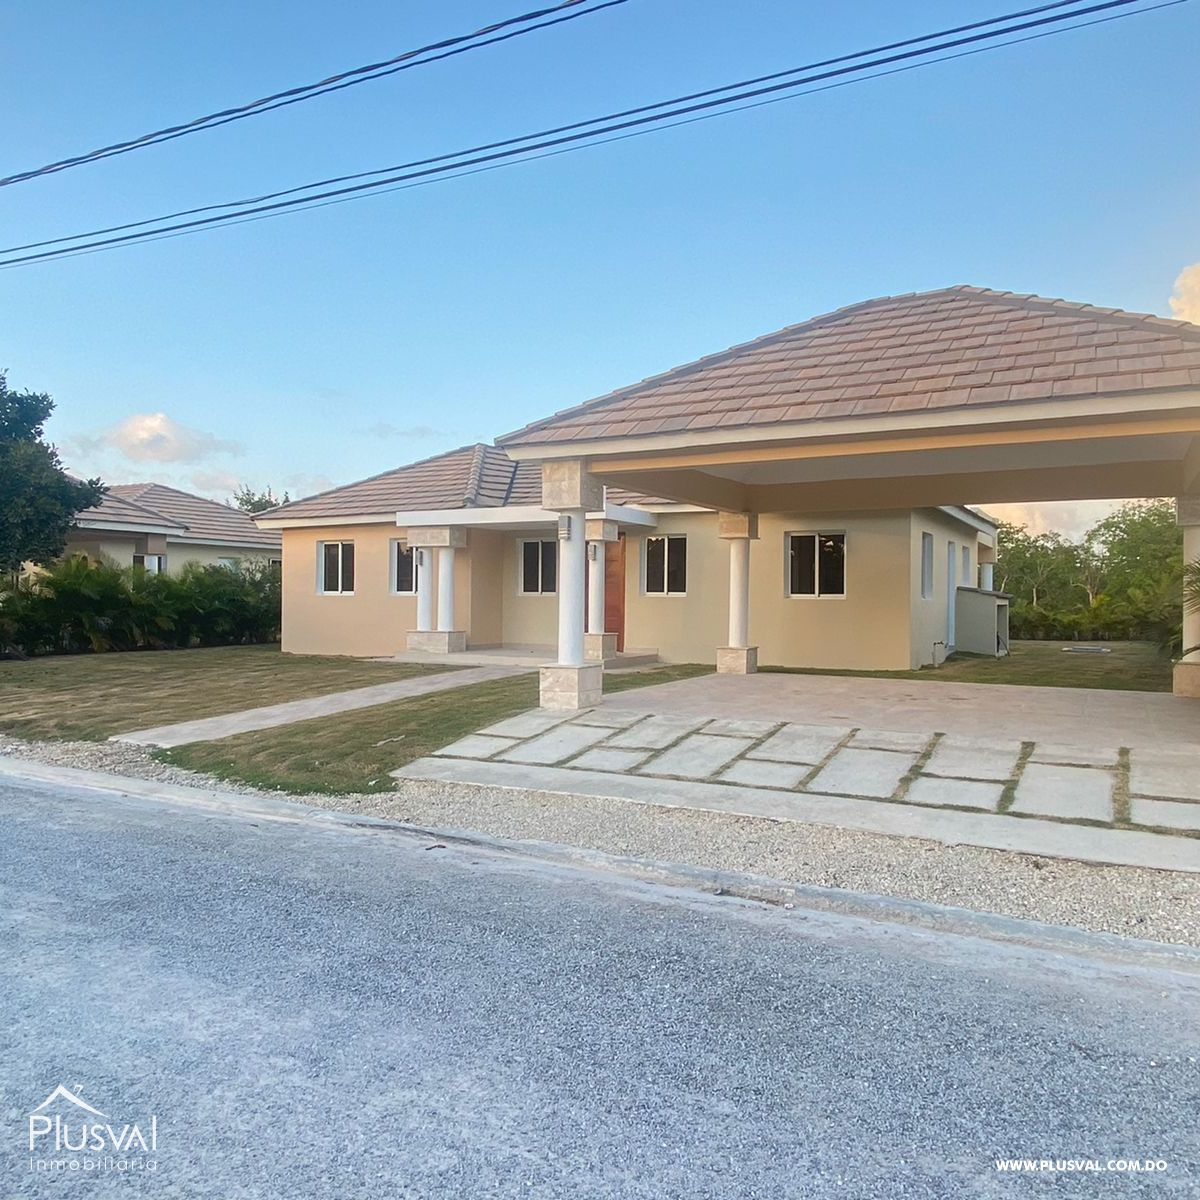 Proyecto exclusivo de casas con piscina en Punta Cana 174079